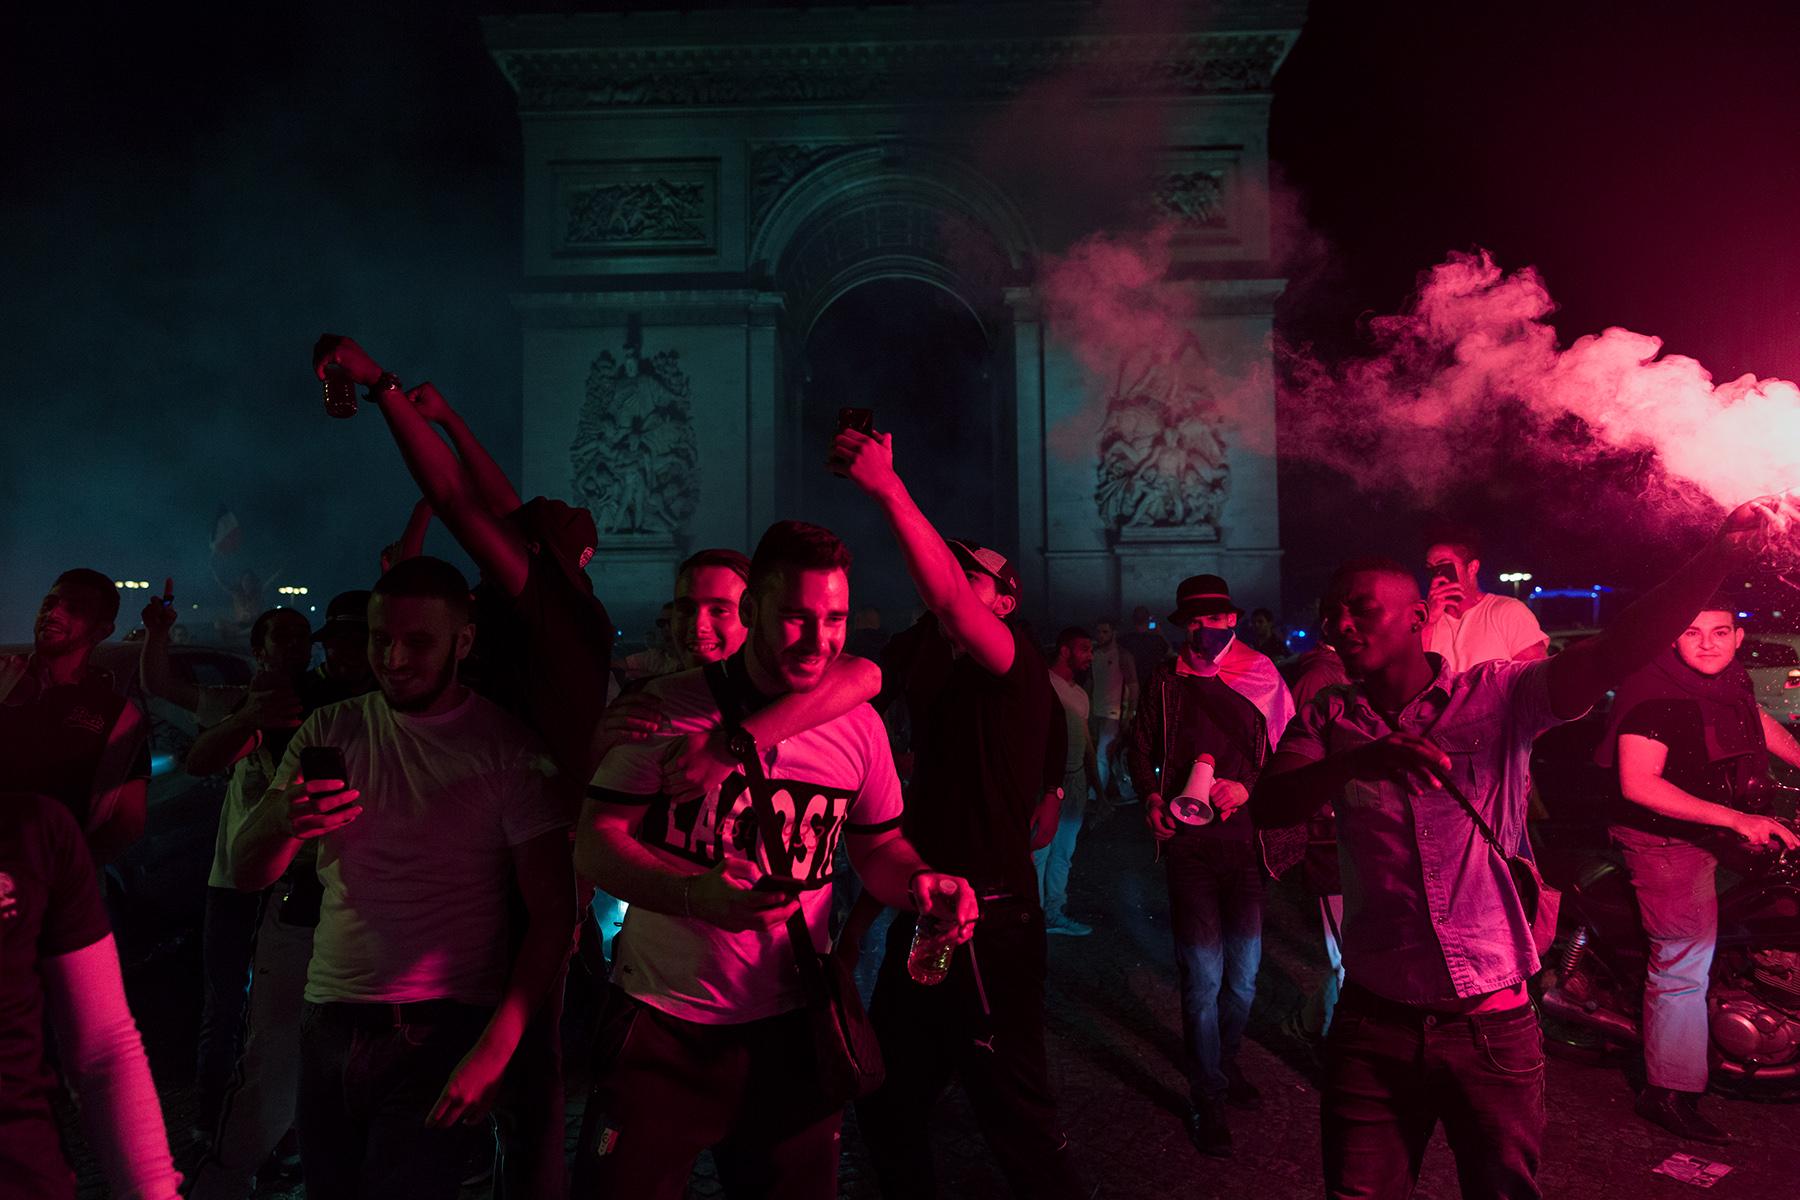 Euro2016_ArnaudAndrieu17